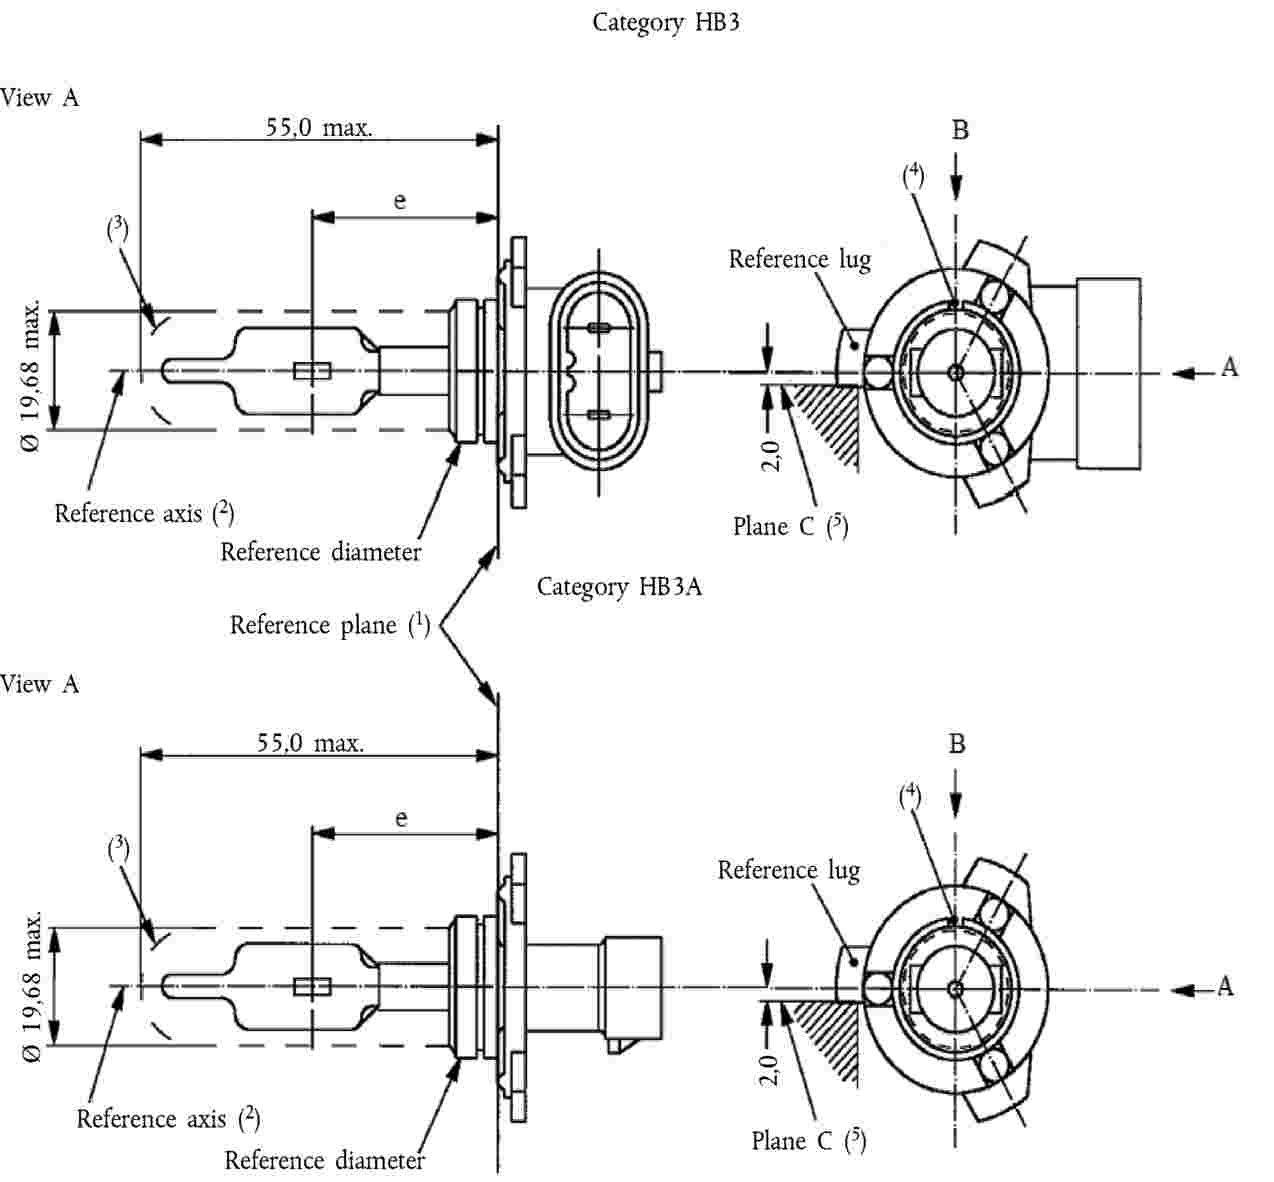 Eur Lex 42014x071802 En Case Ih 856 Wiring Diagram Image